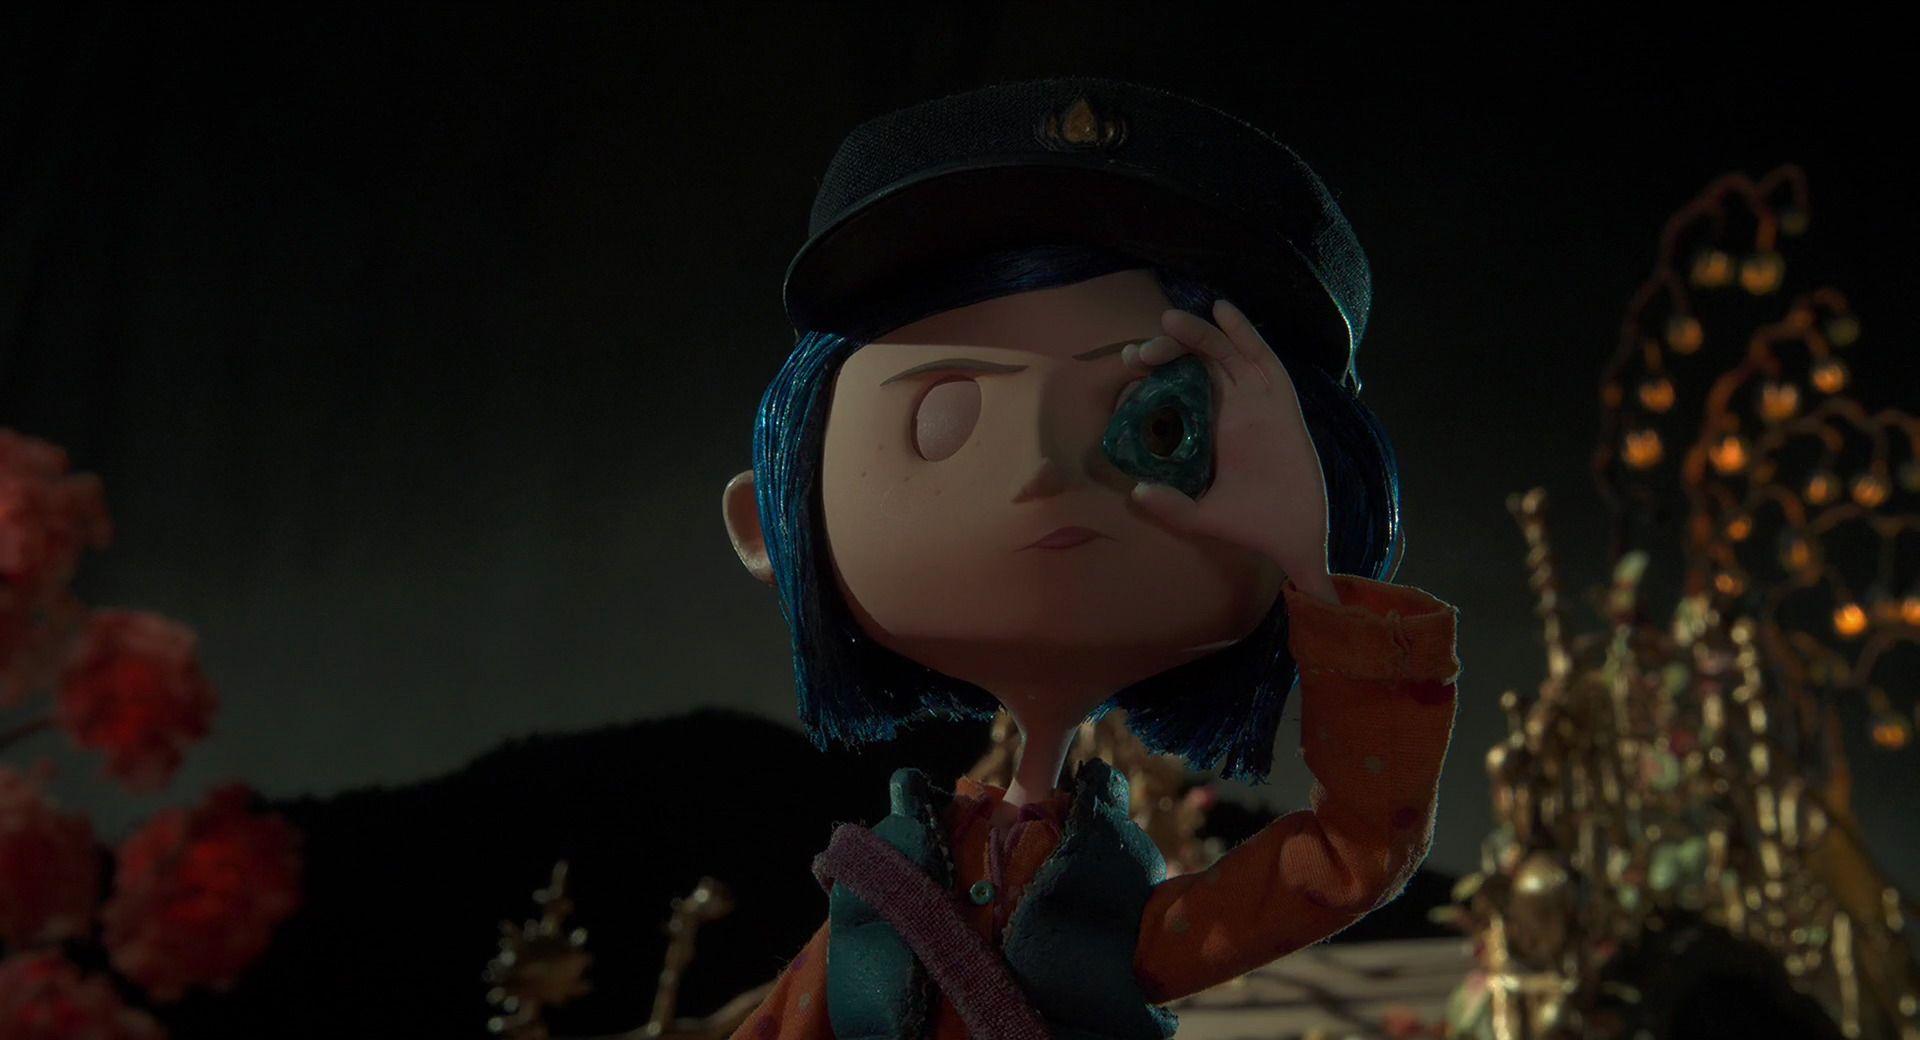 Coraline (2009) - Animation Screencaps